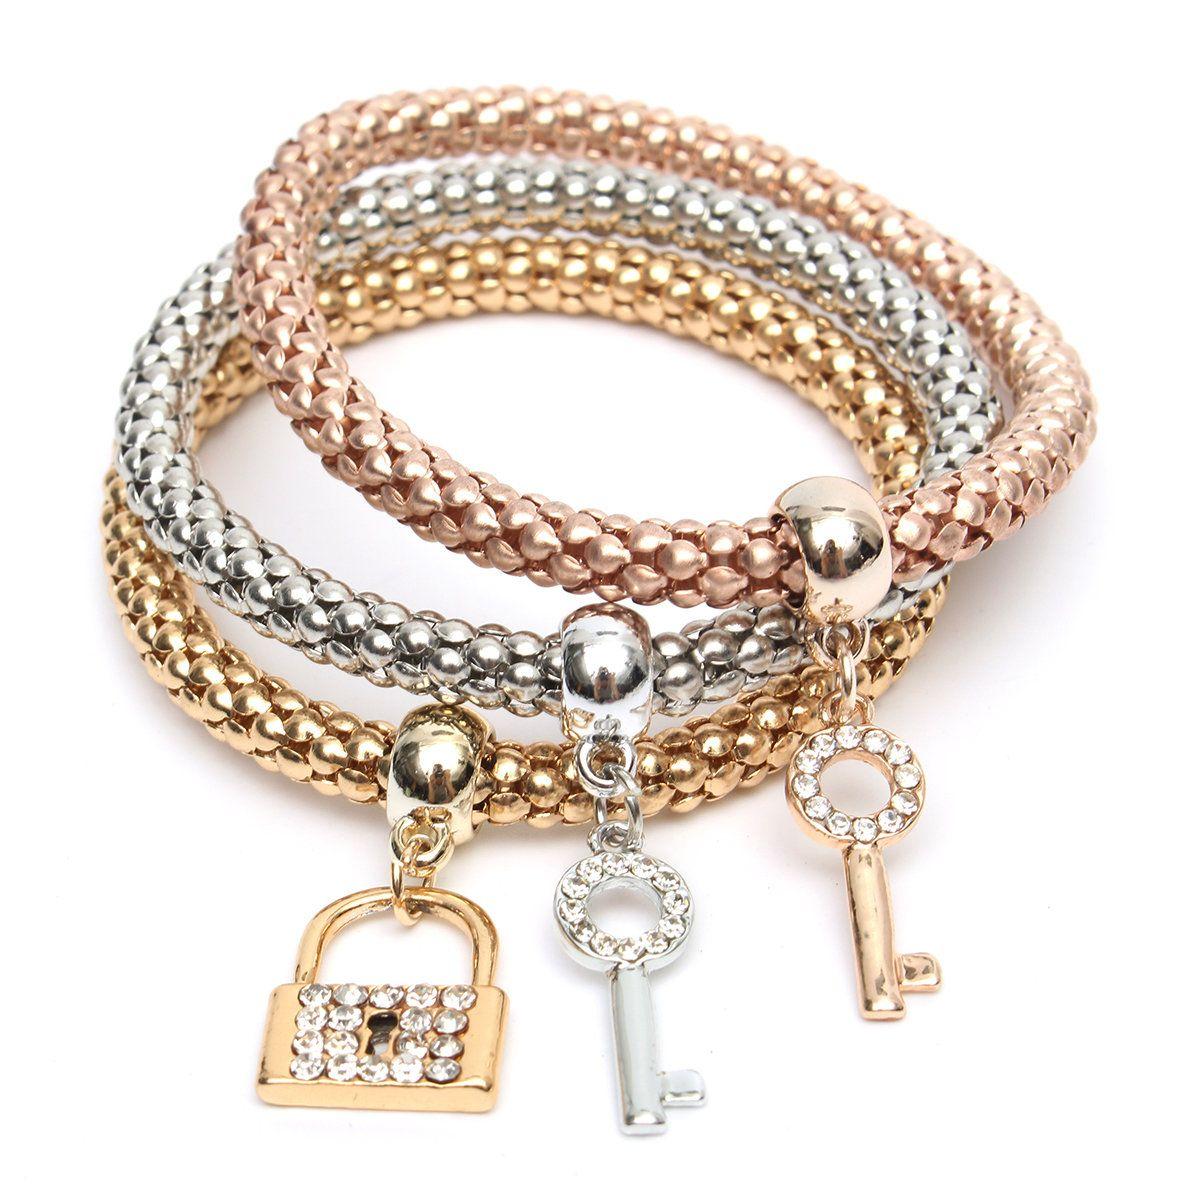 Pcs elastic crystal love key pendant elegant gold silver multilayer